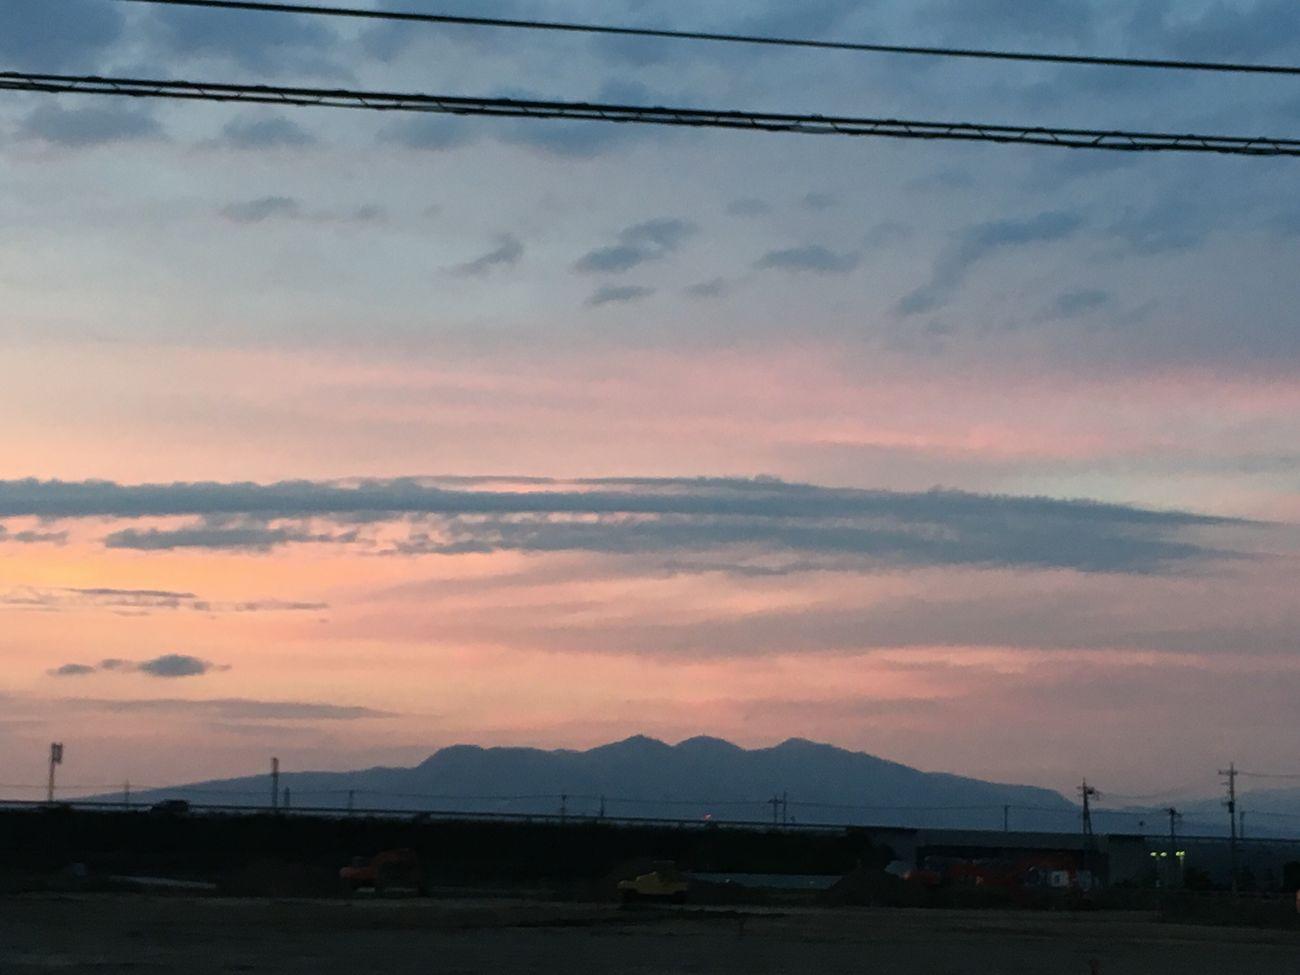 赤城山 黄昏 夕暮れ